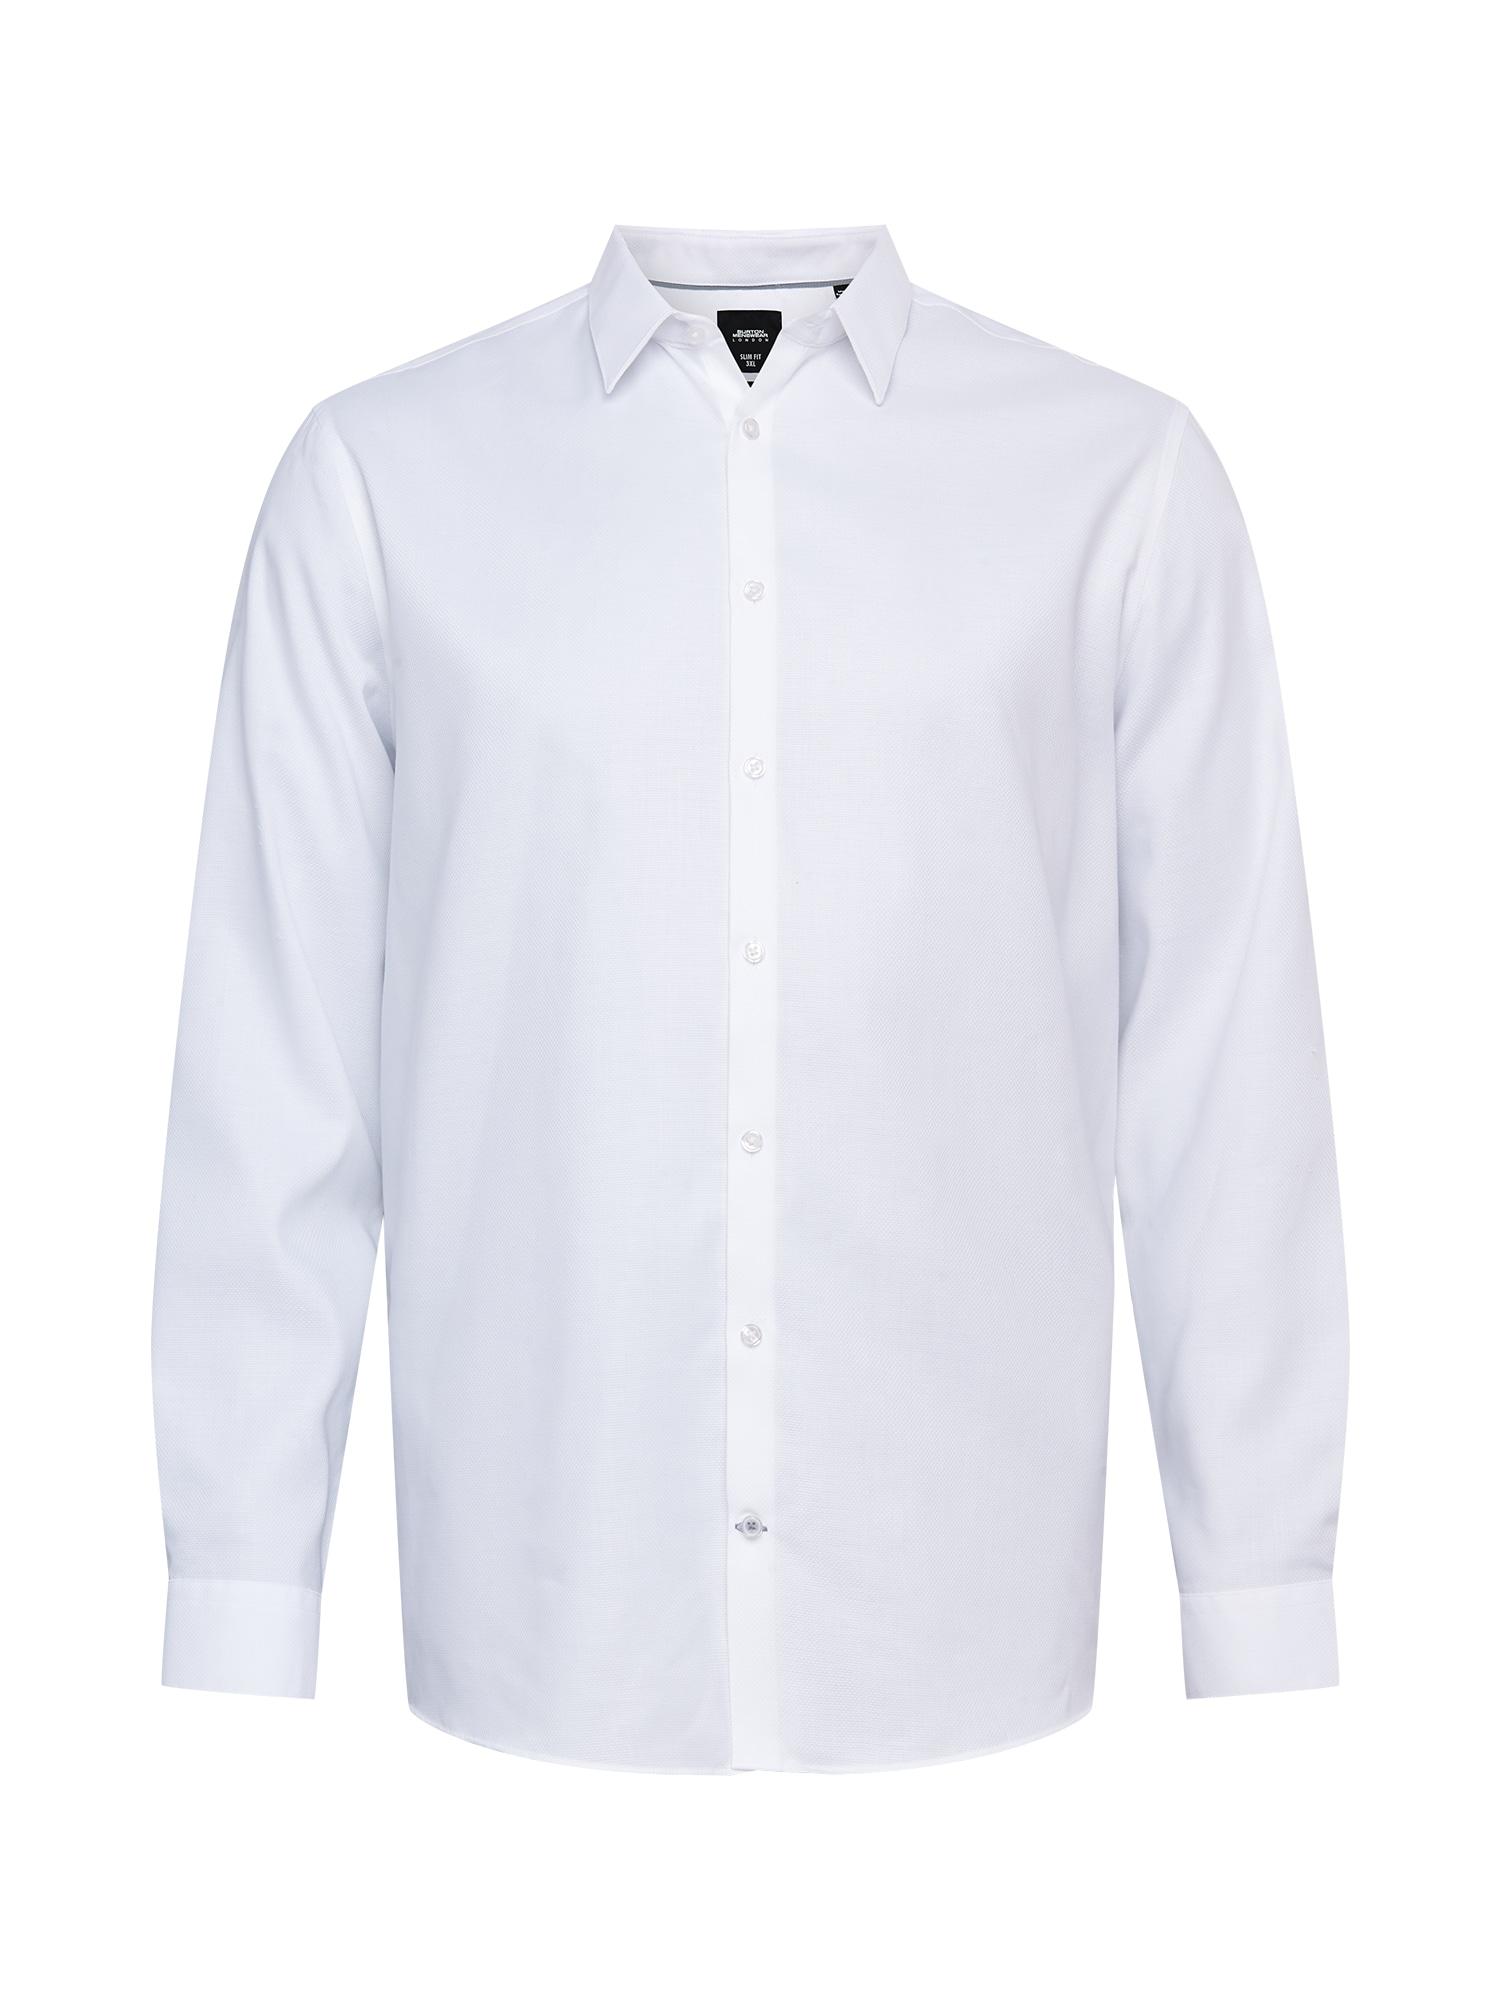 BURTON MENSWEAR LONDON (Big & Tall) Marškiniai